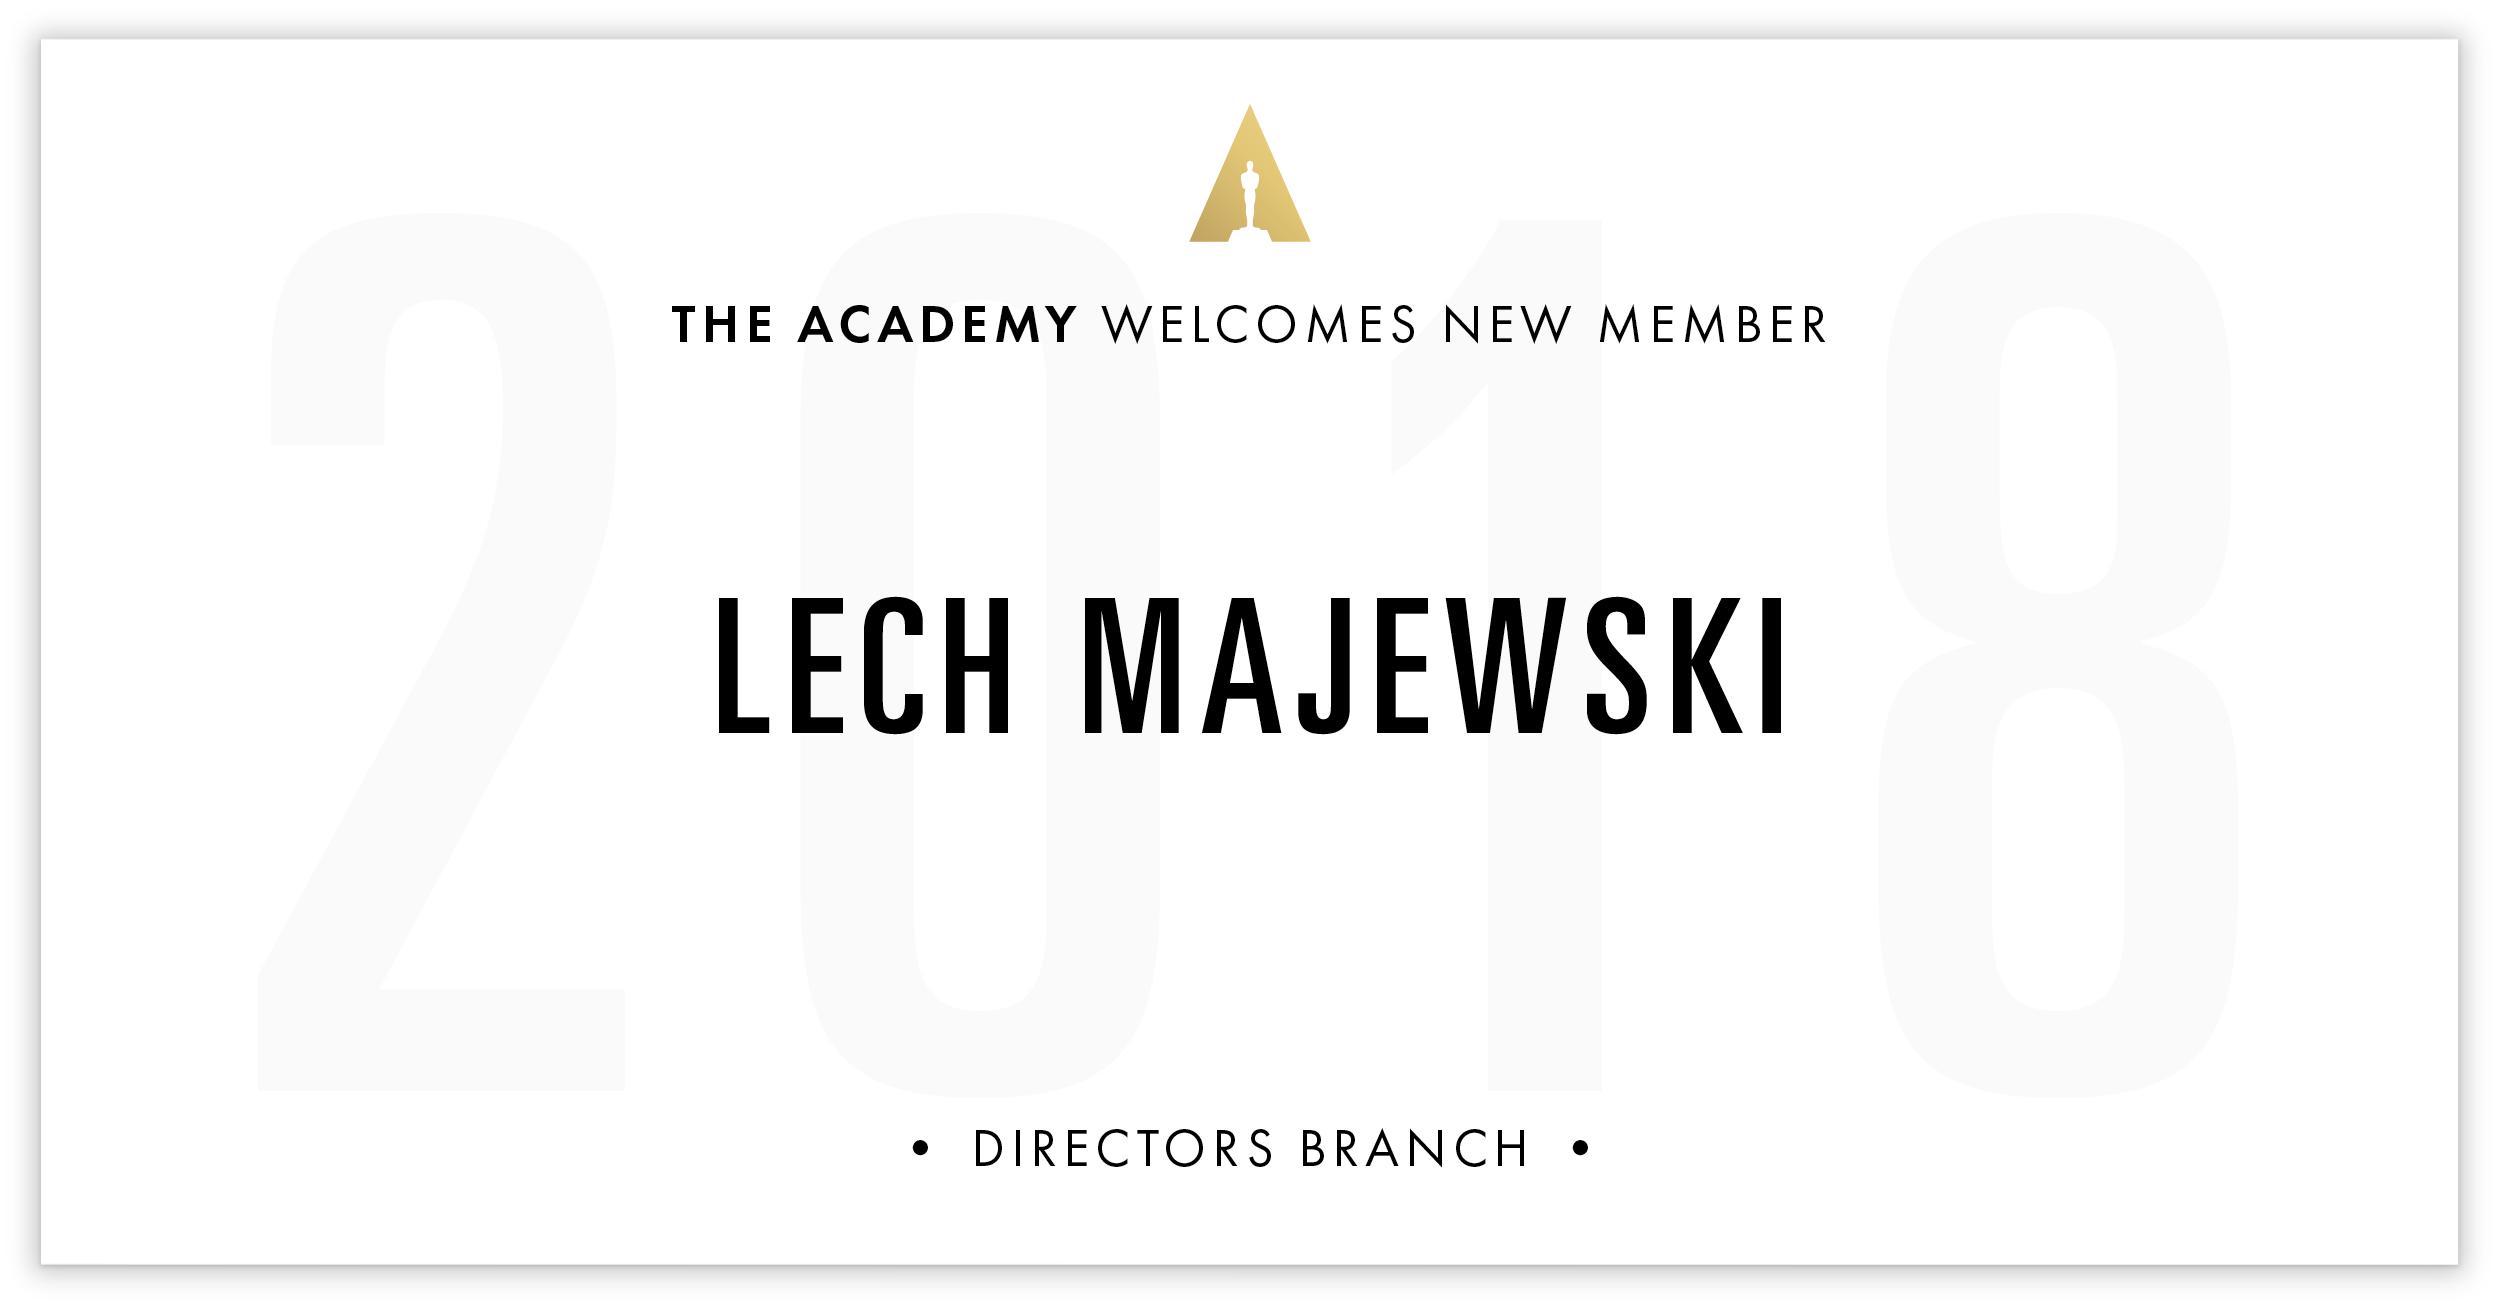 Lech Majewski is invited!